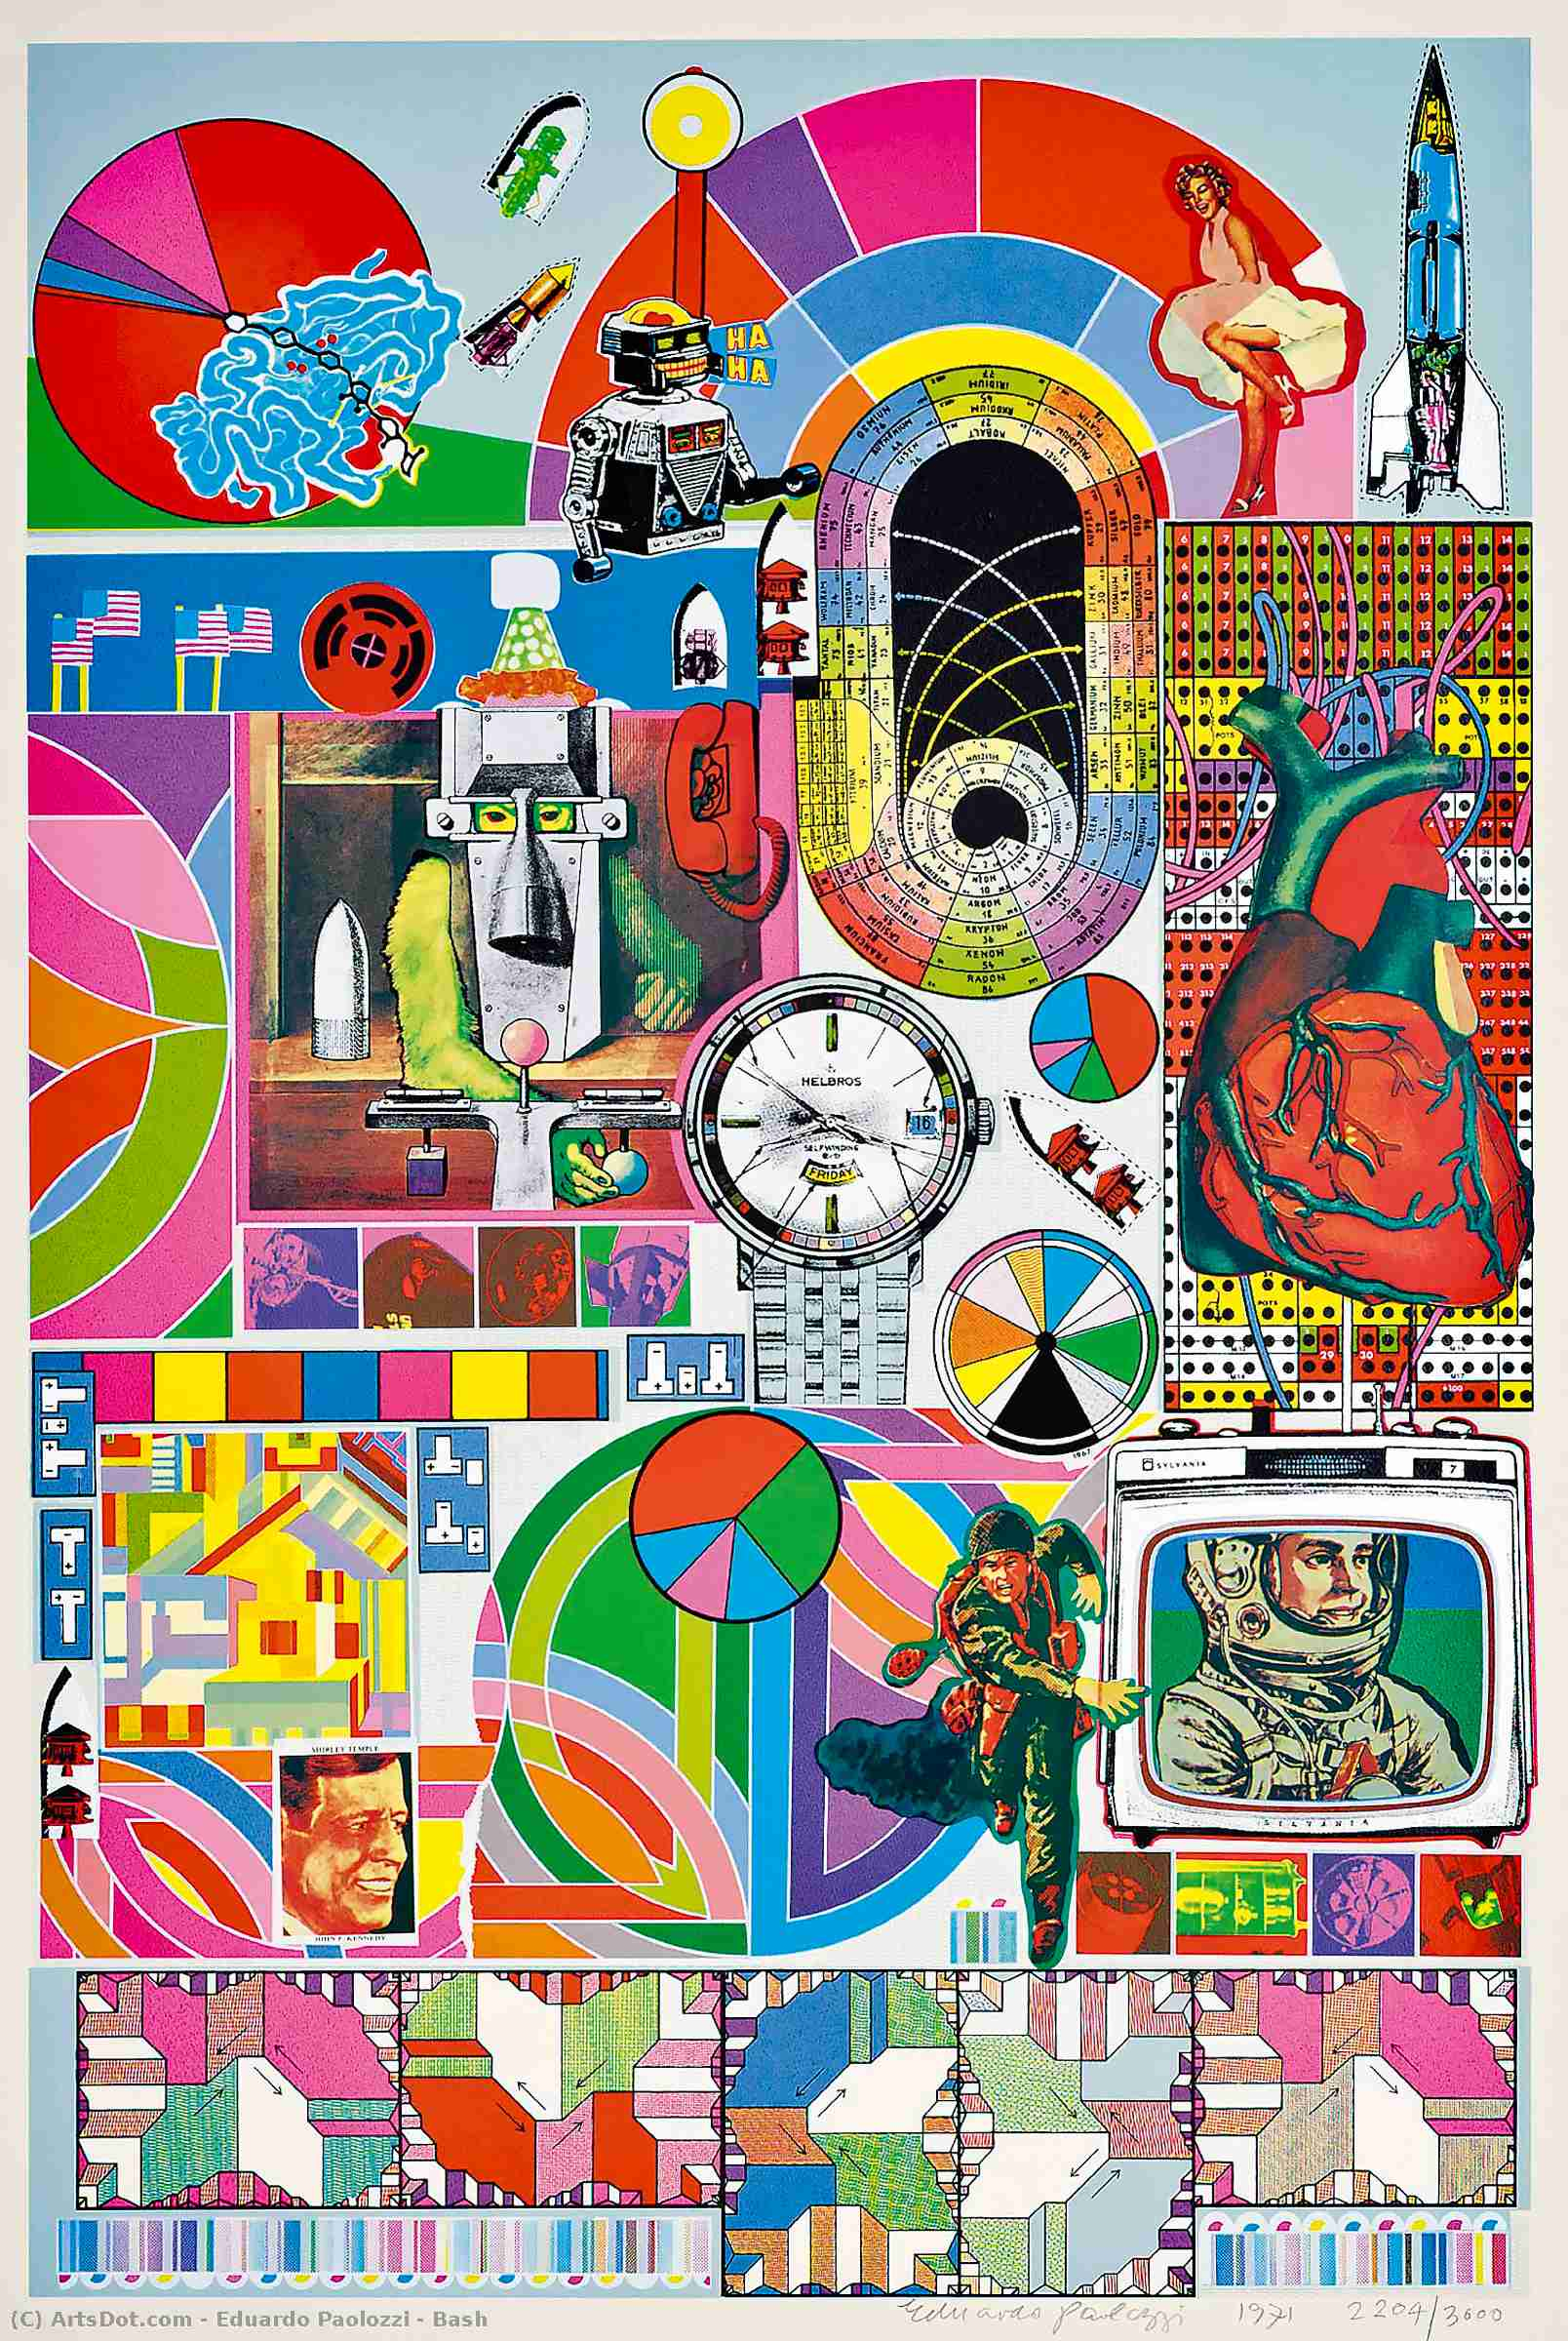 Wikioo.org - The Encyclopedia of Fine Arts - Painting, Artwork by Eduardo Paolozzi - Bash